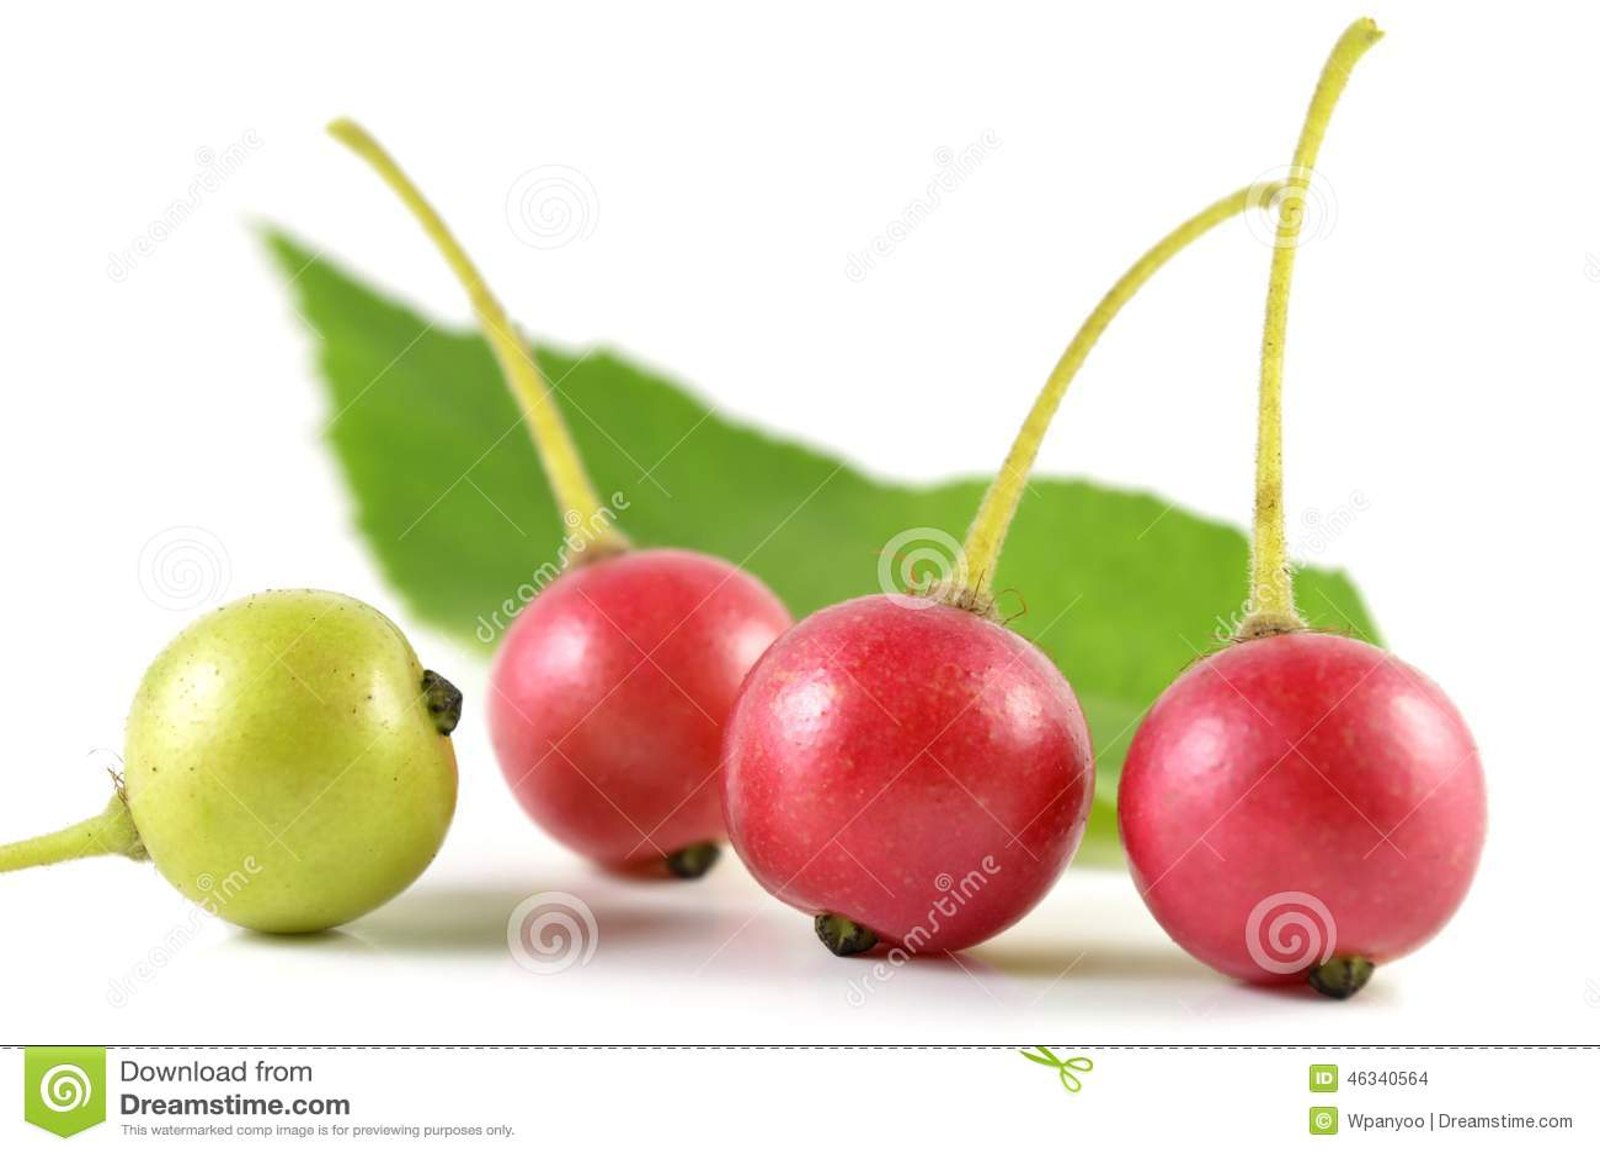 The Jamaican Cherry - InsideJourneys